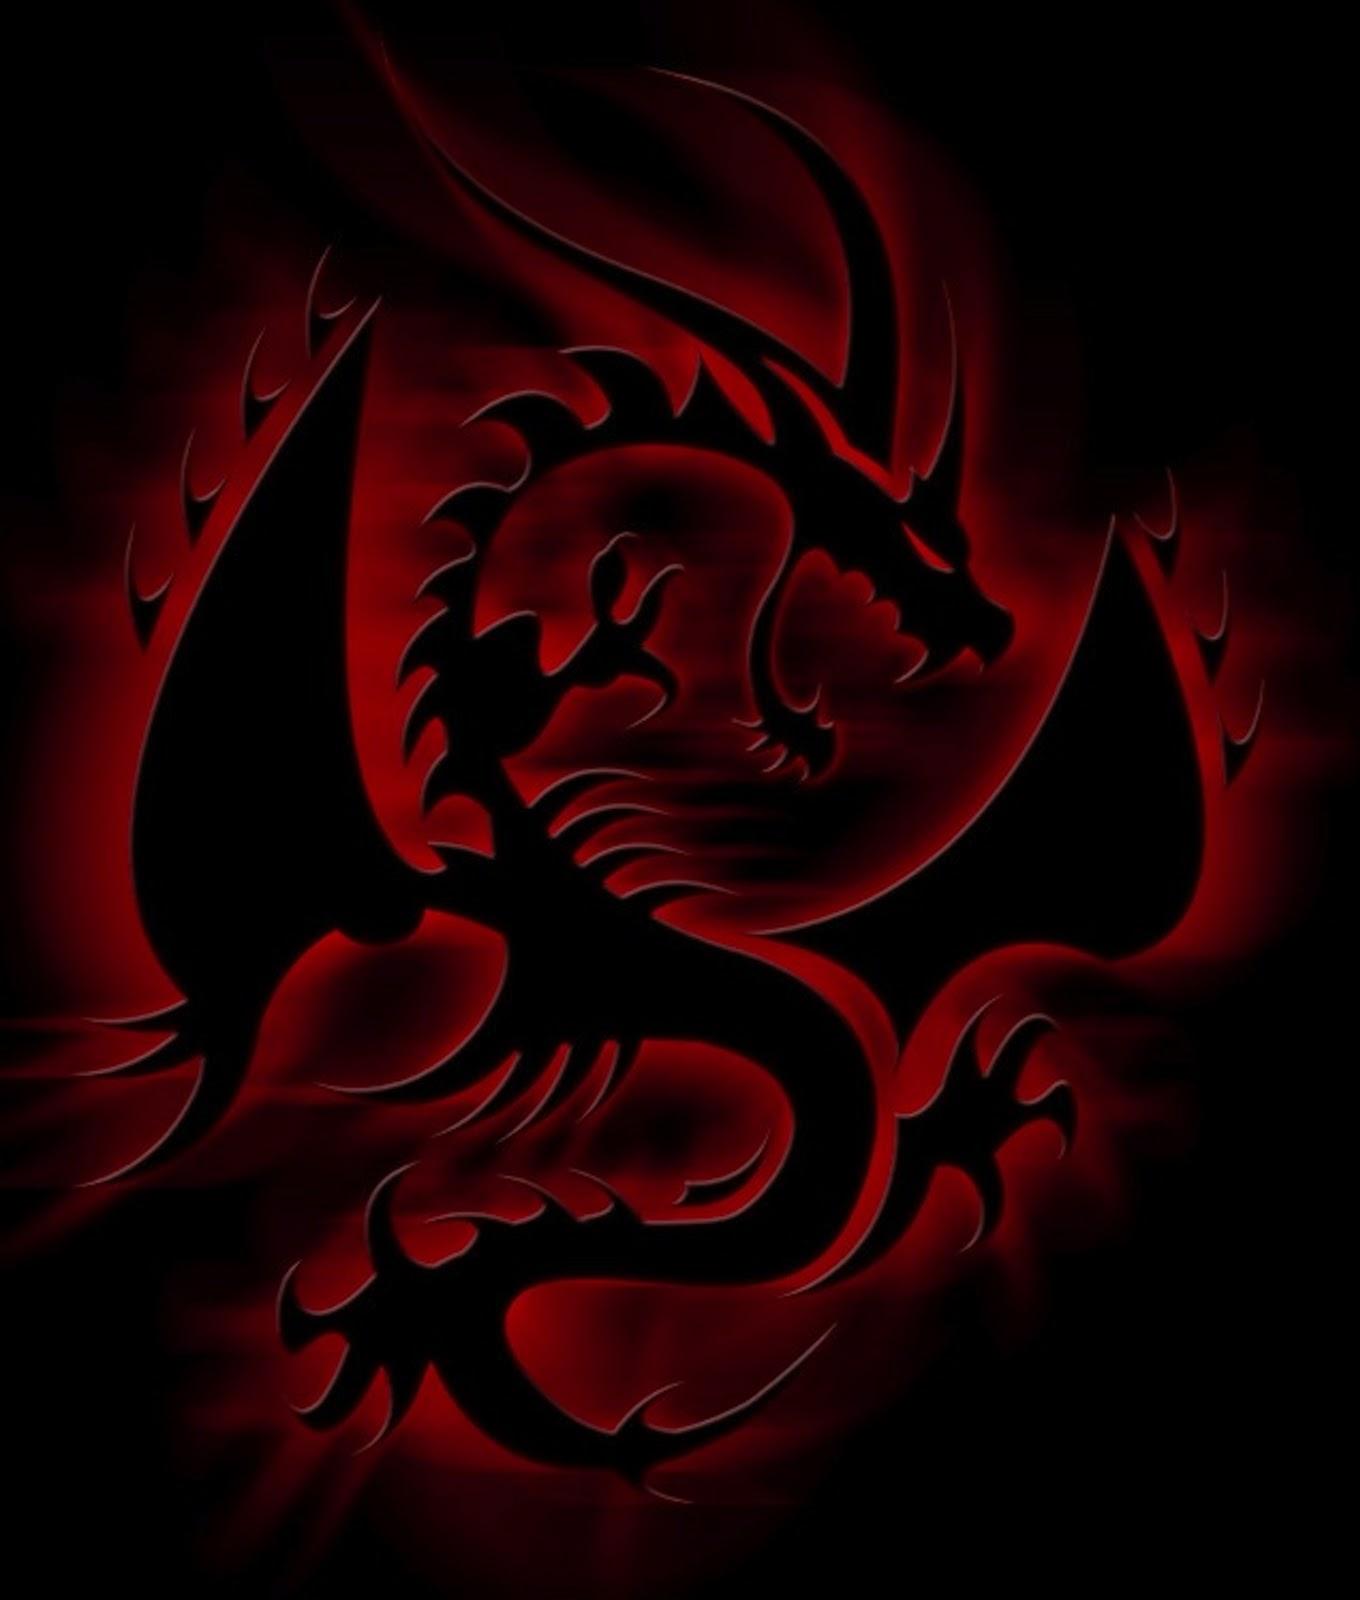 Free Download Black Red Dragon Wallpaper 796zgjpg 1360x1600 For